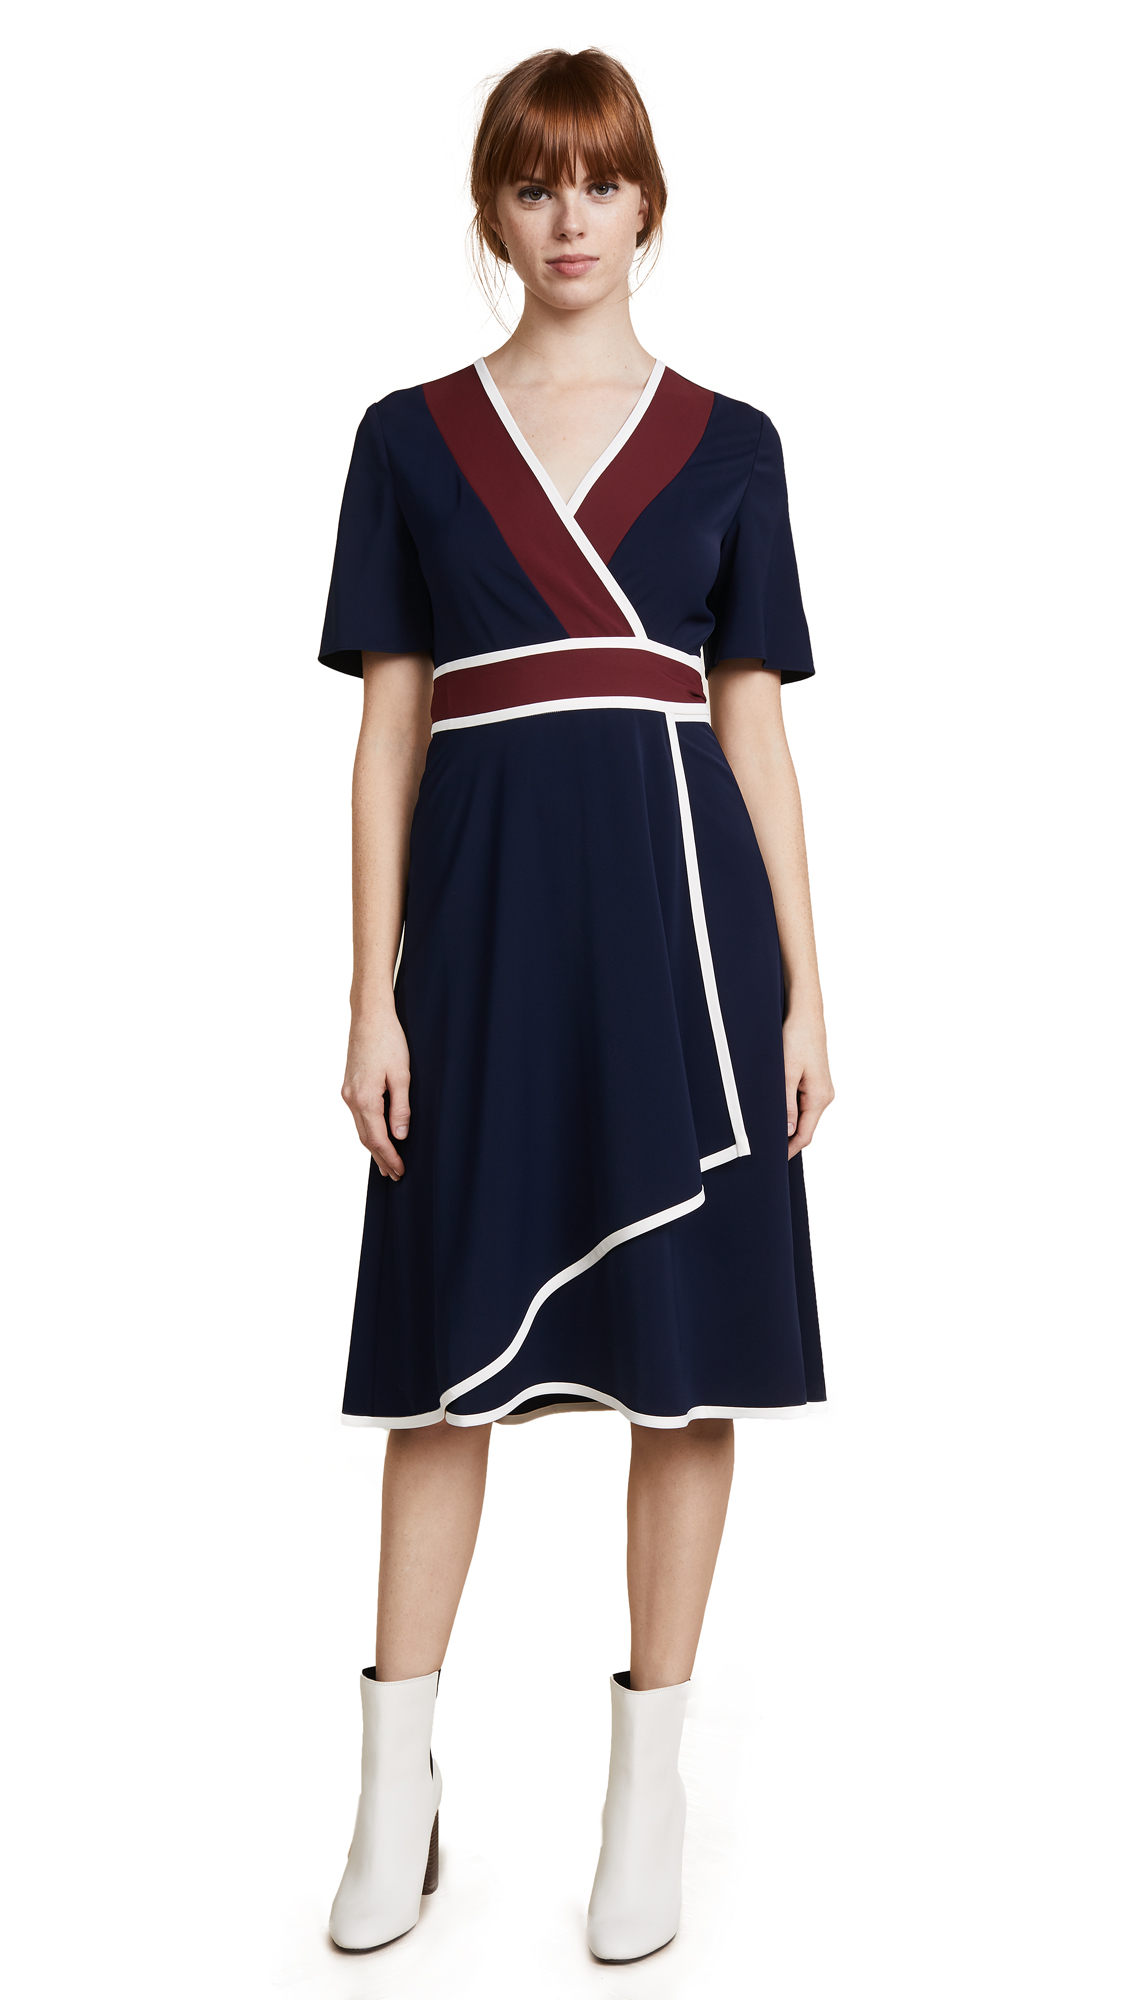 Tory Burch Peggy Wrap Dress - Tory Navy